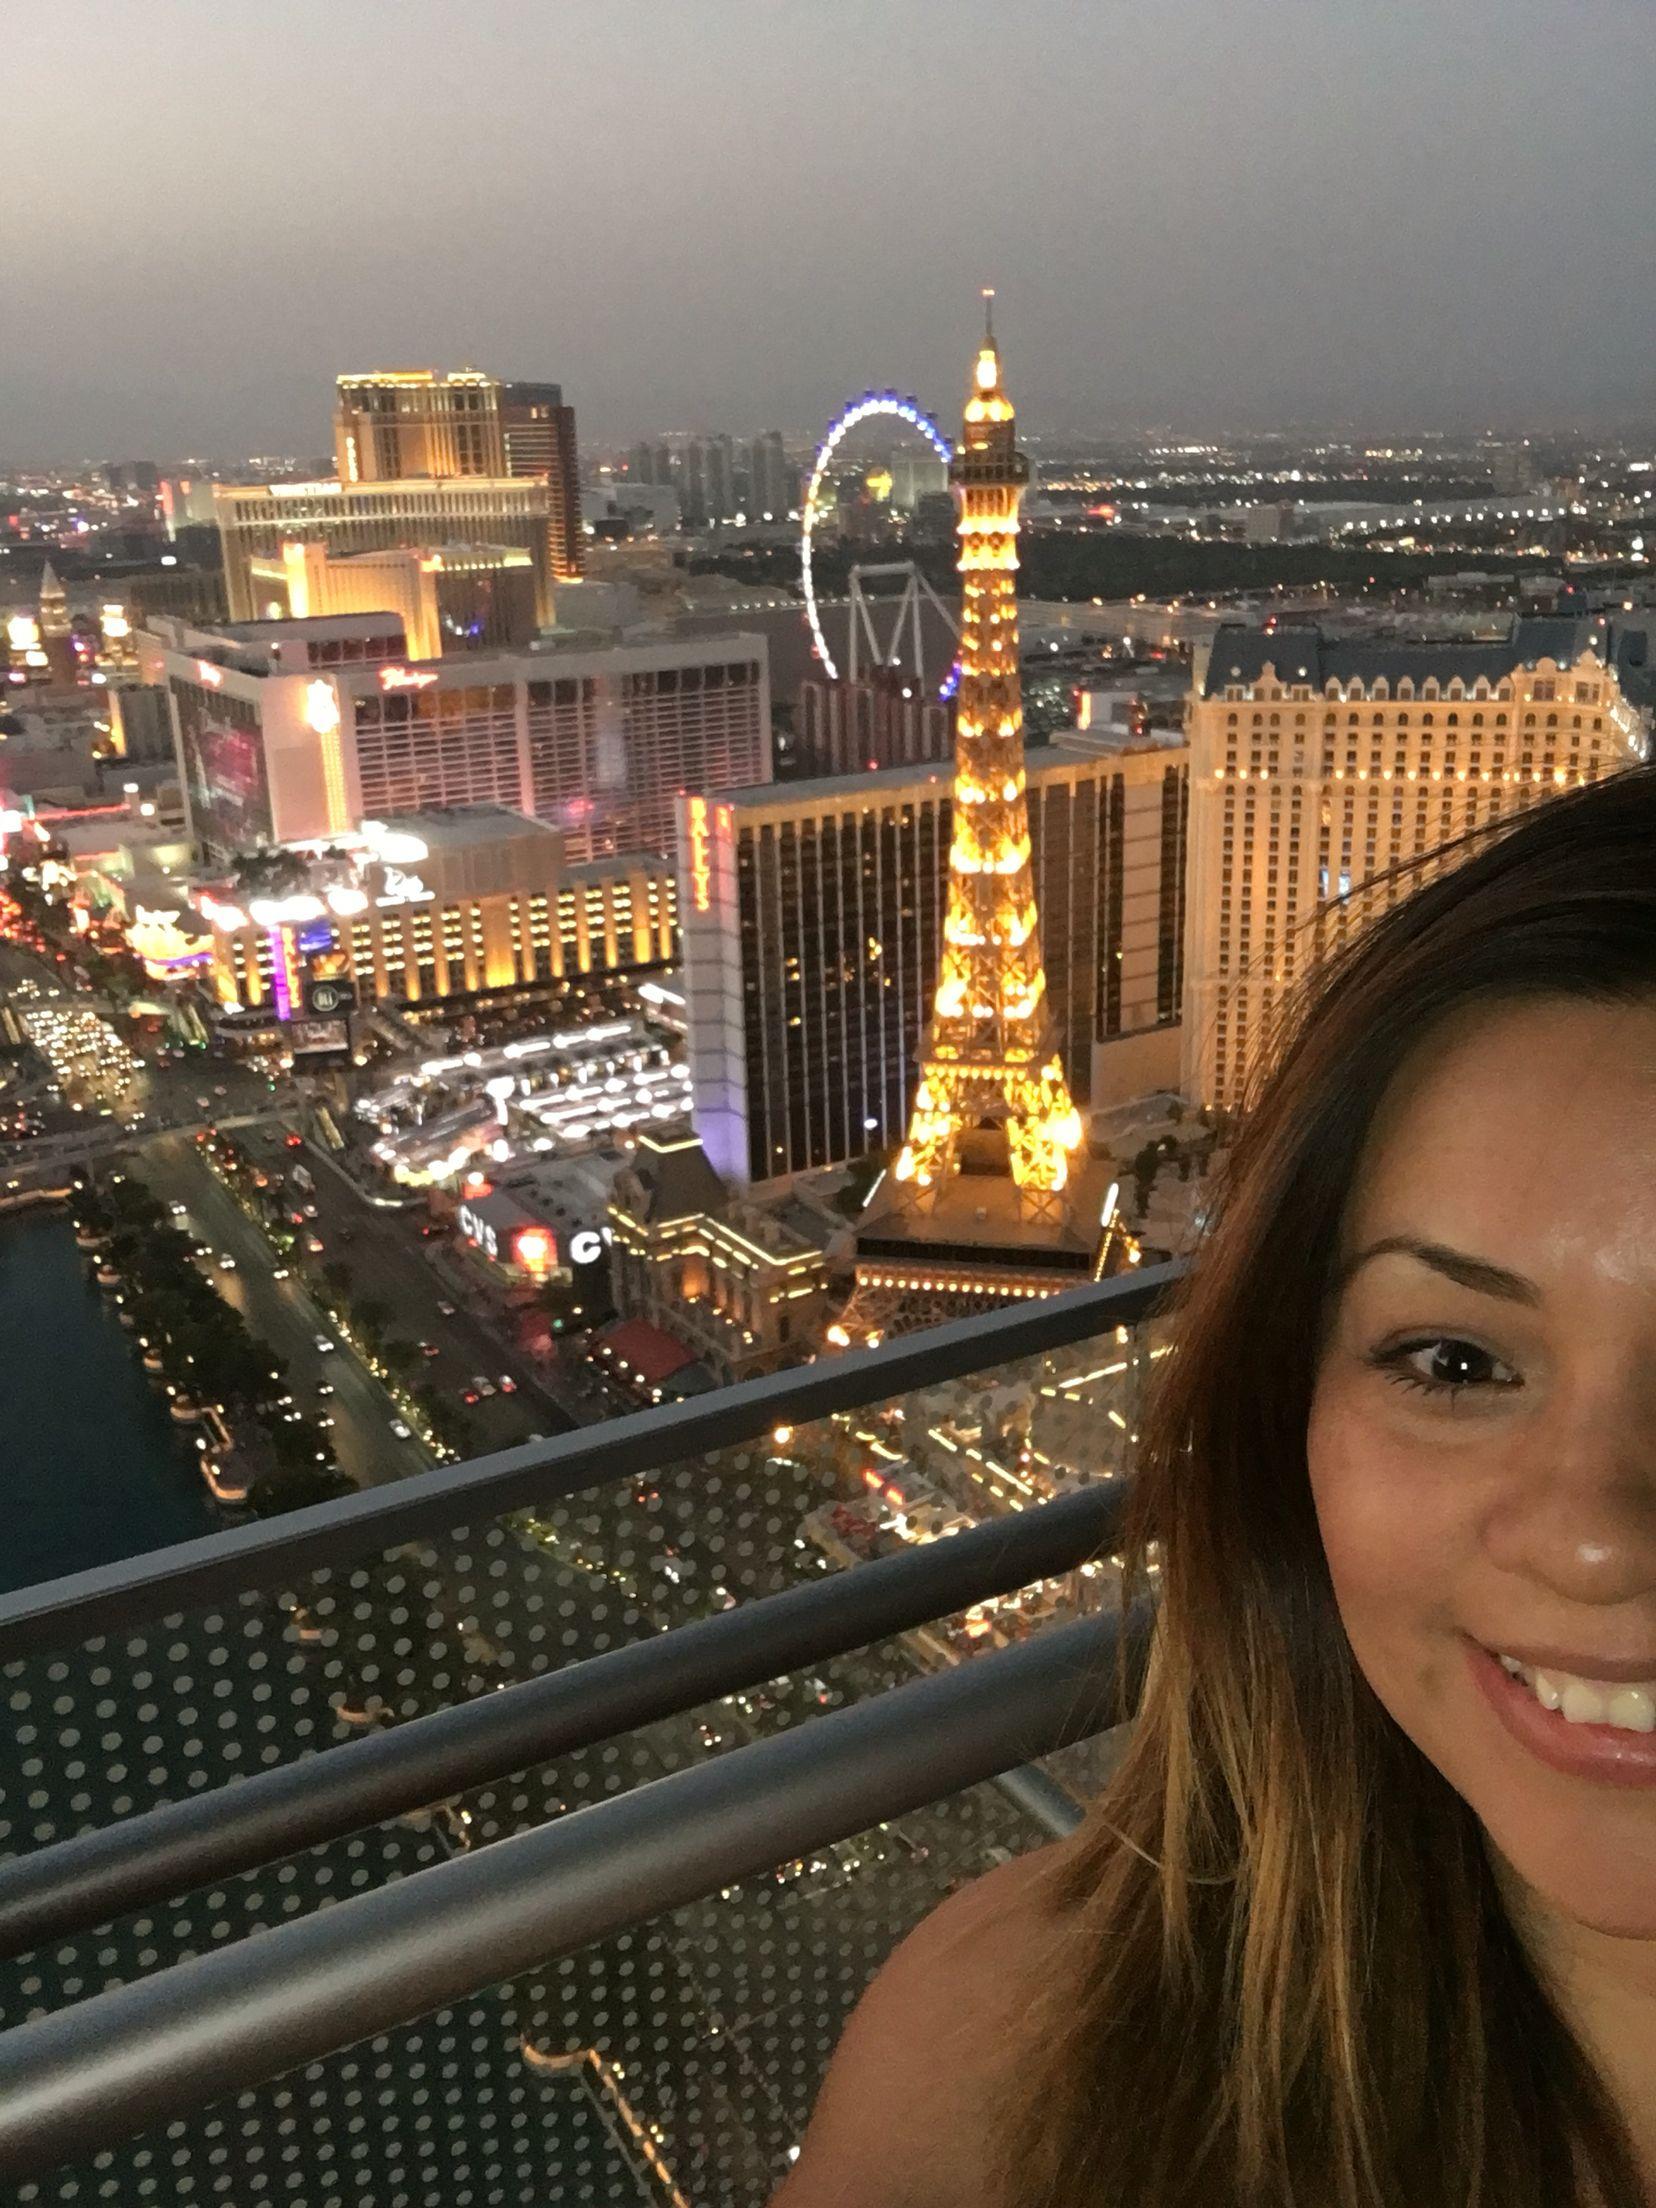 The cosmopolitan terrace premium view